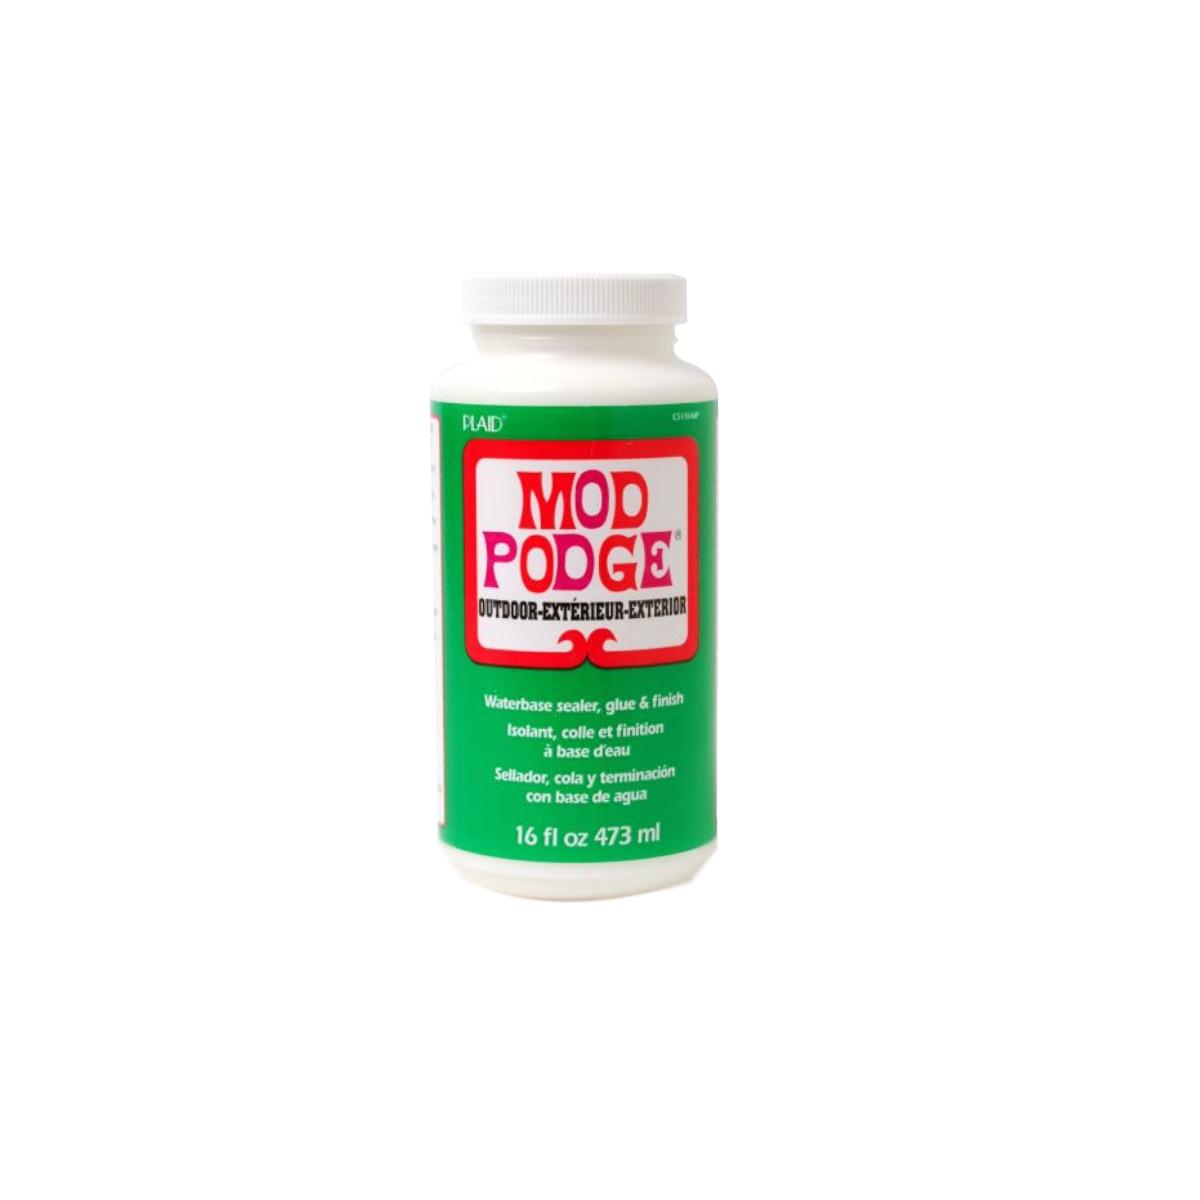 Mod Podge, 473 ml